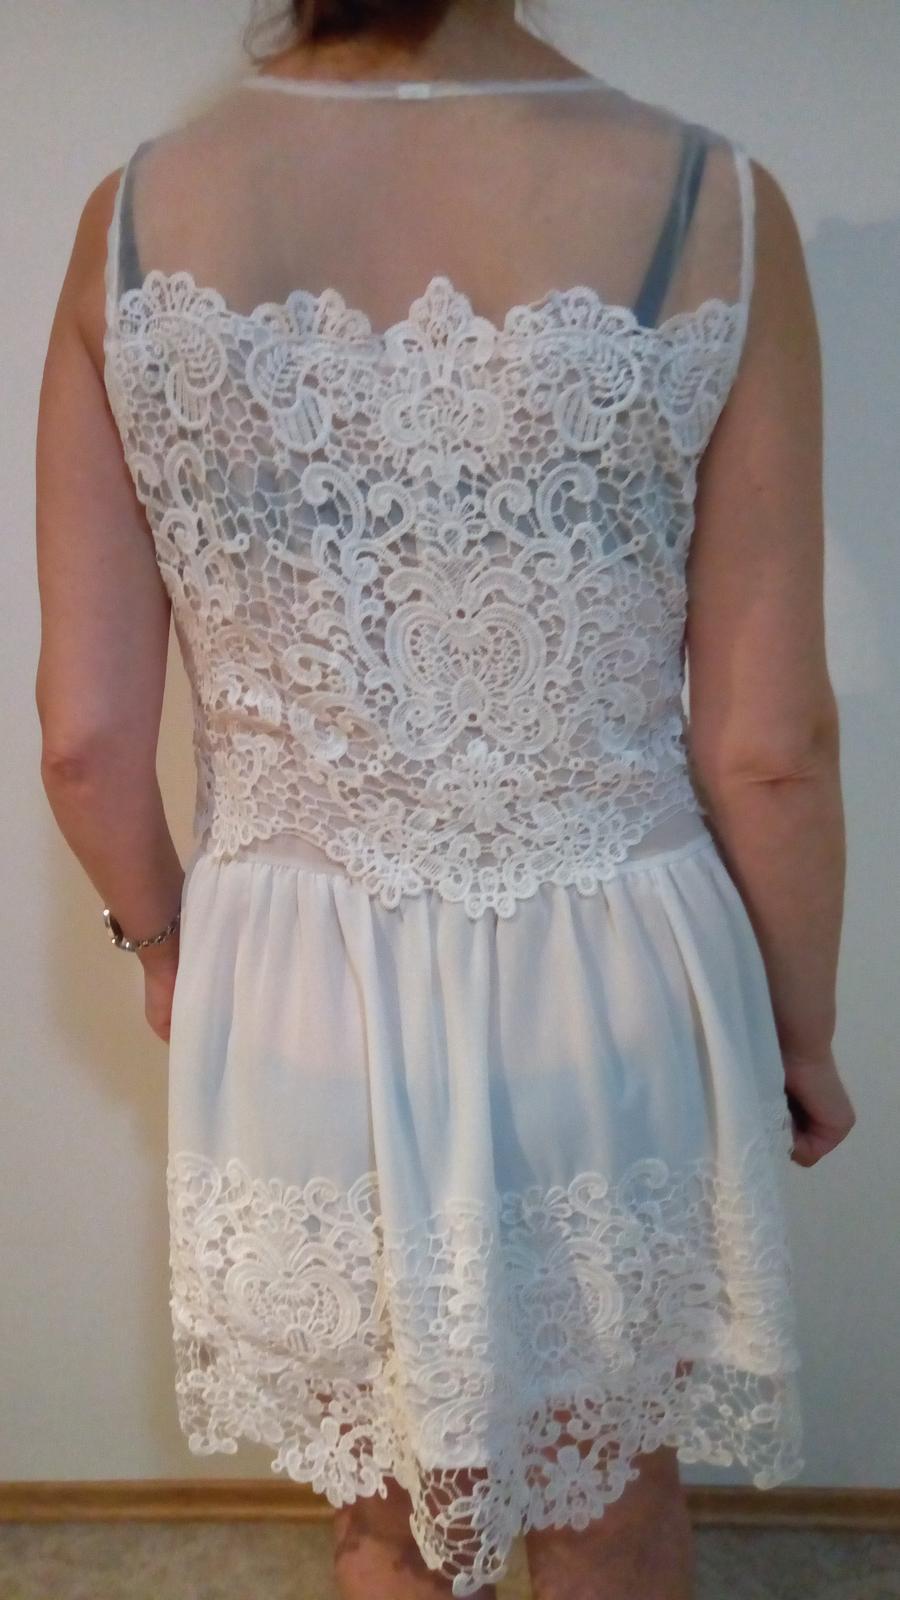 biele šaty M - Obrázok č. 3